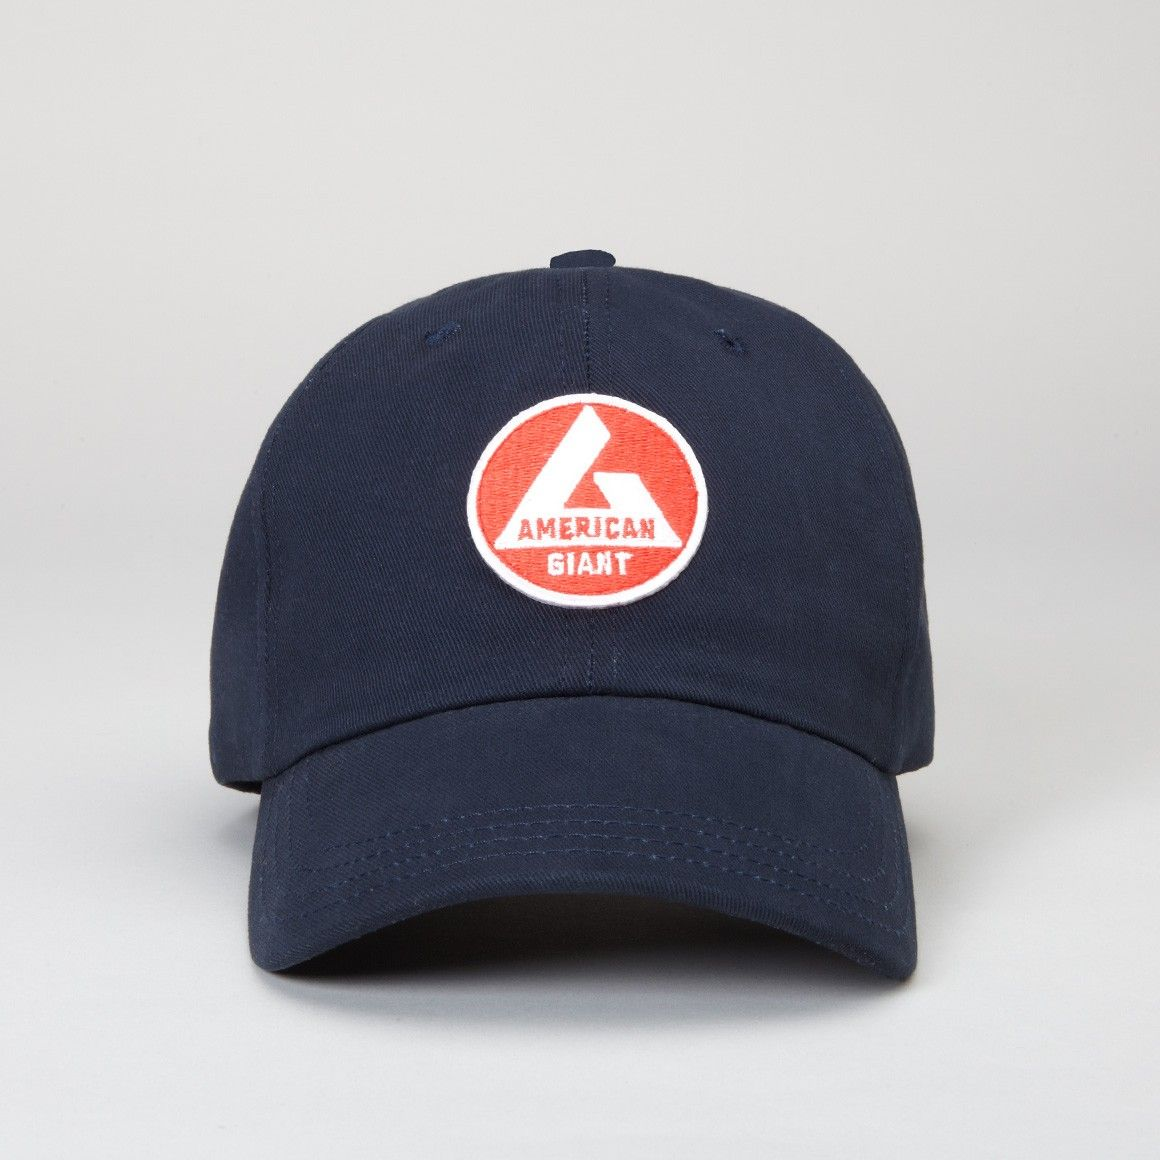 a5002f7e American Giant. Cotton Twill Baseball Hat - Hats - Men | Hats ...